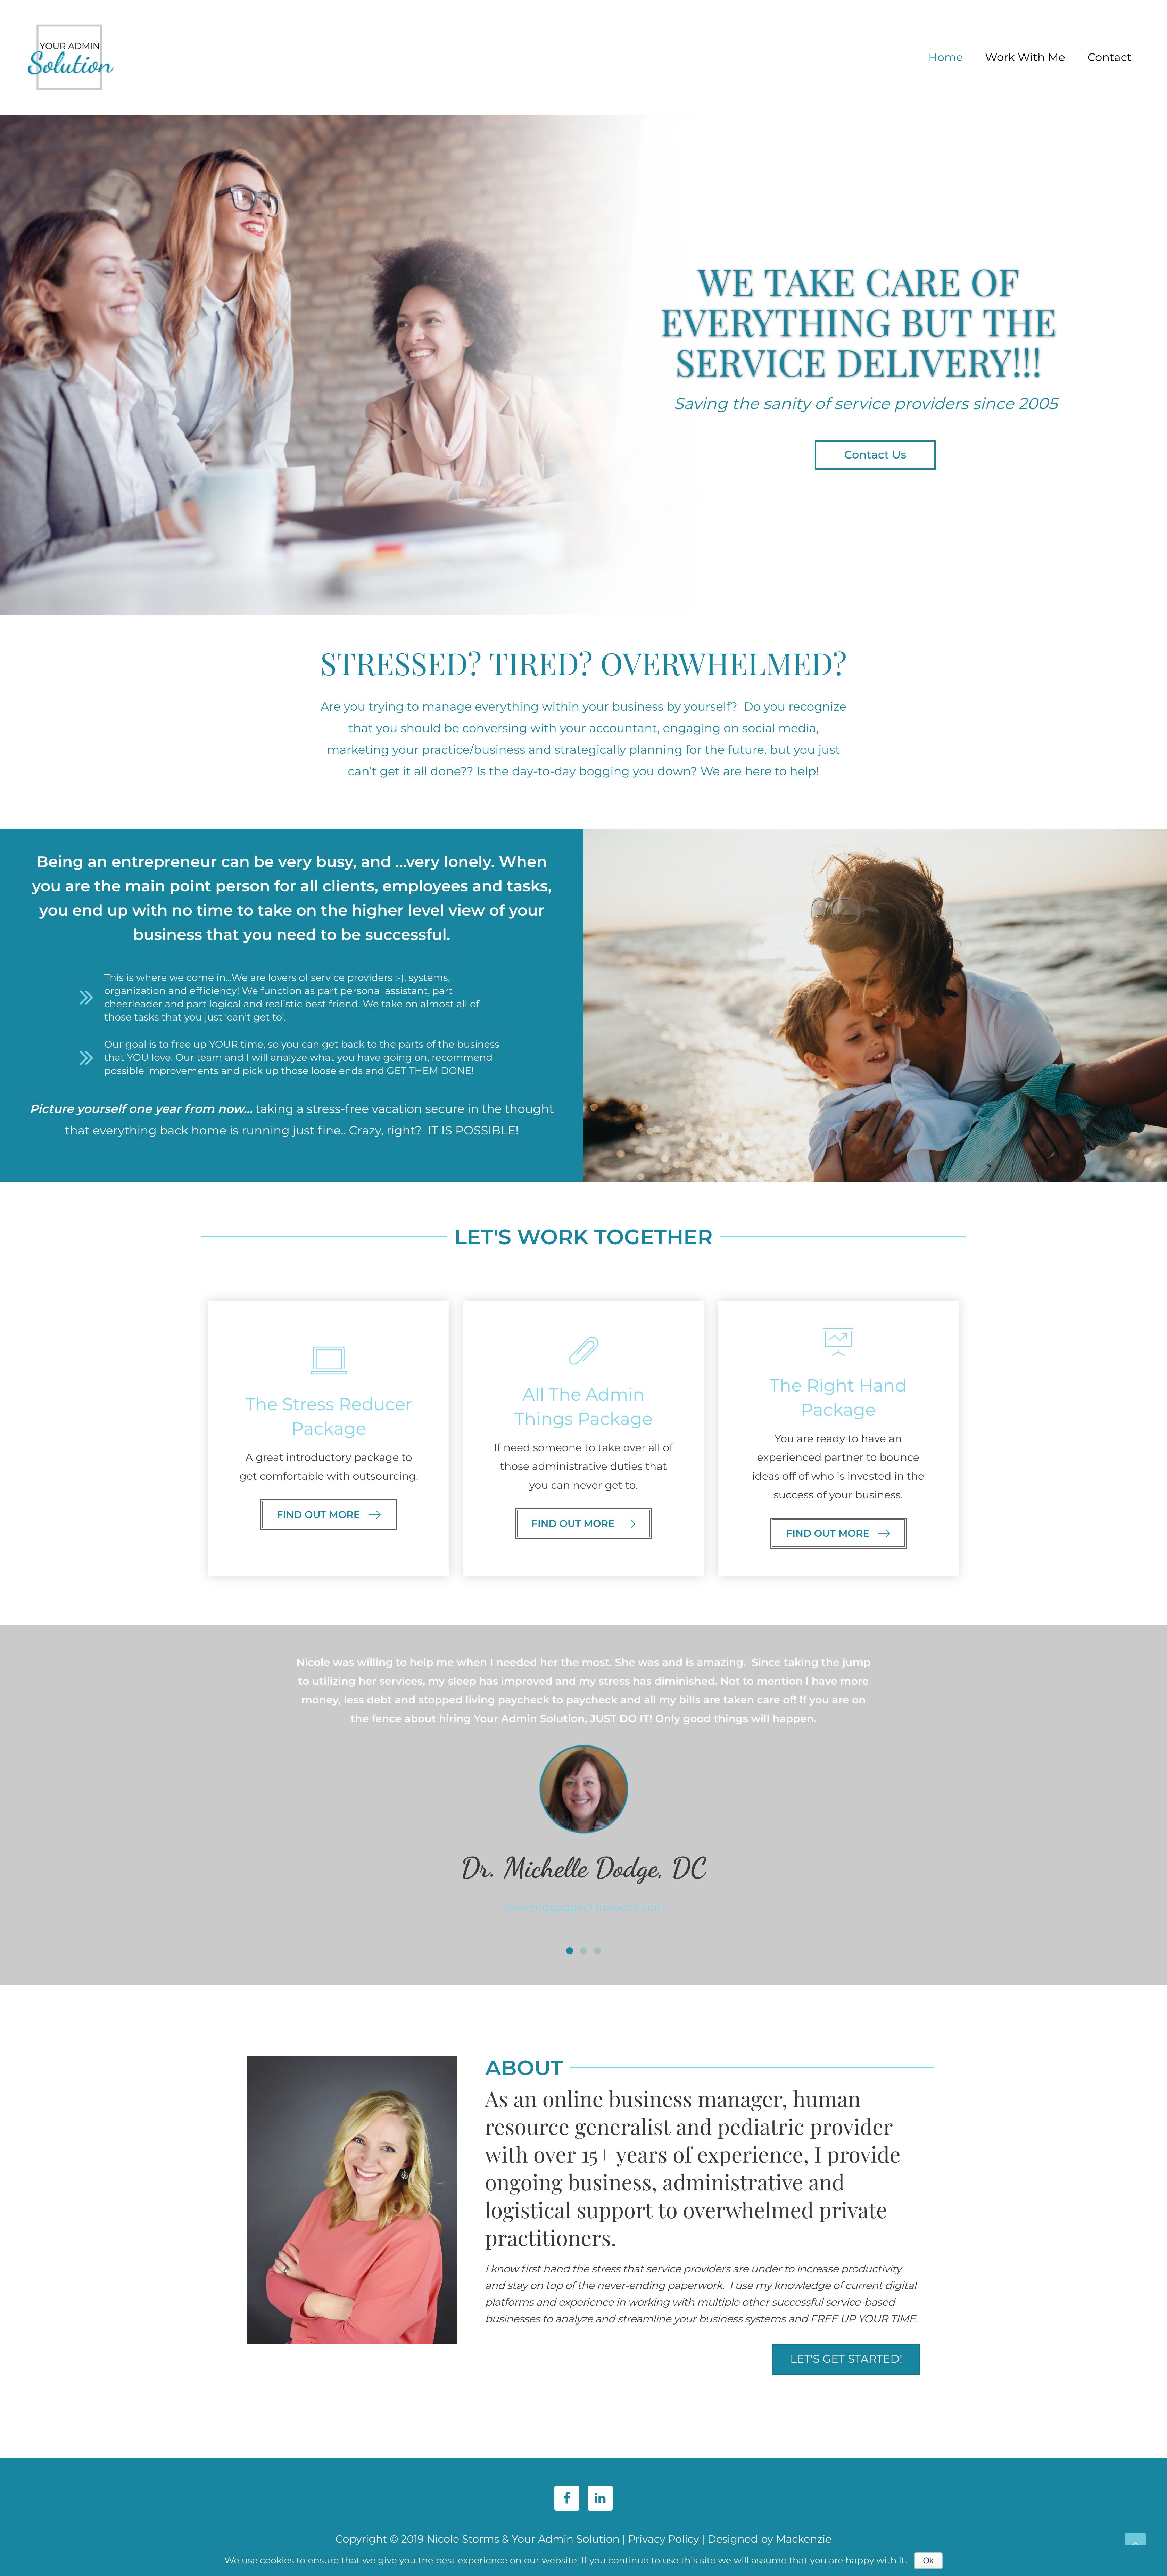 Website Design Inspiration For Female Entrepreneurs Web Design Tips Freelance Web Design Web Design